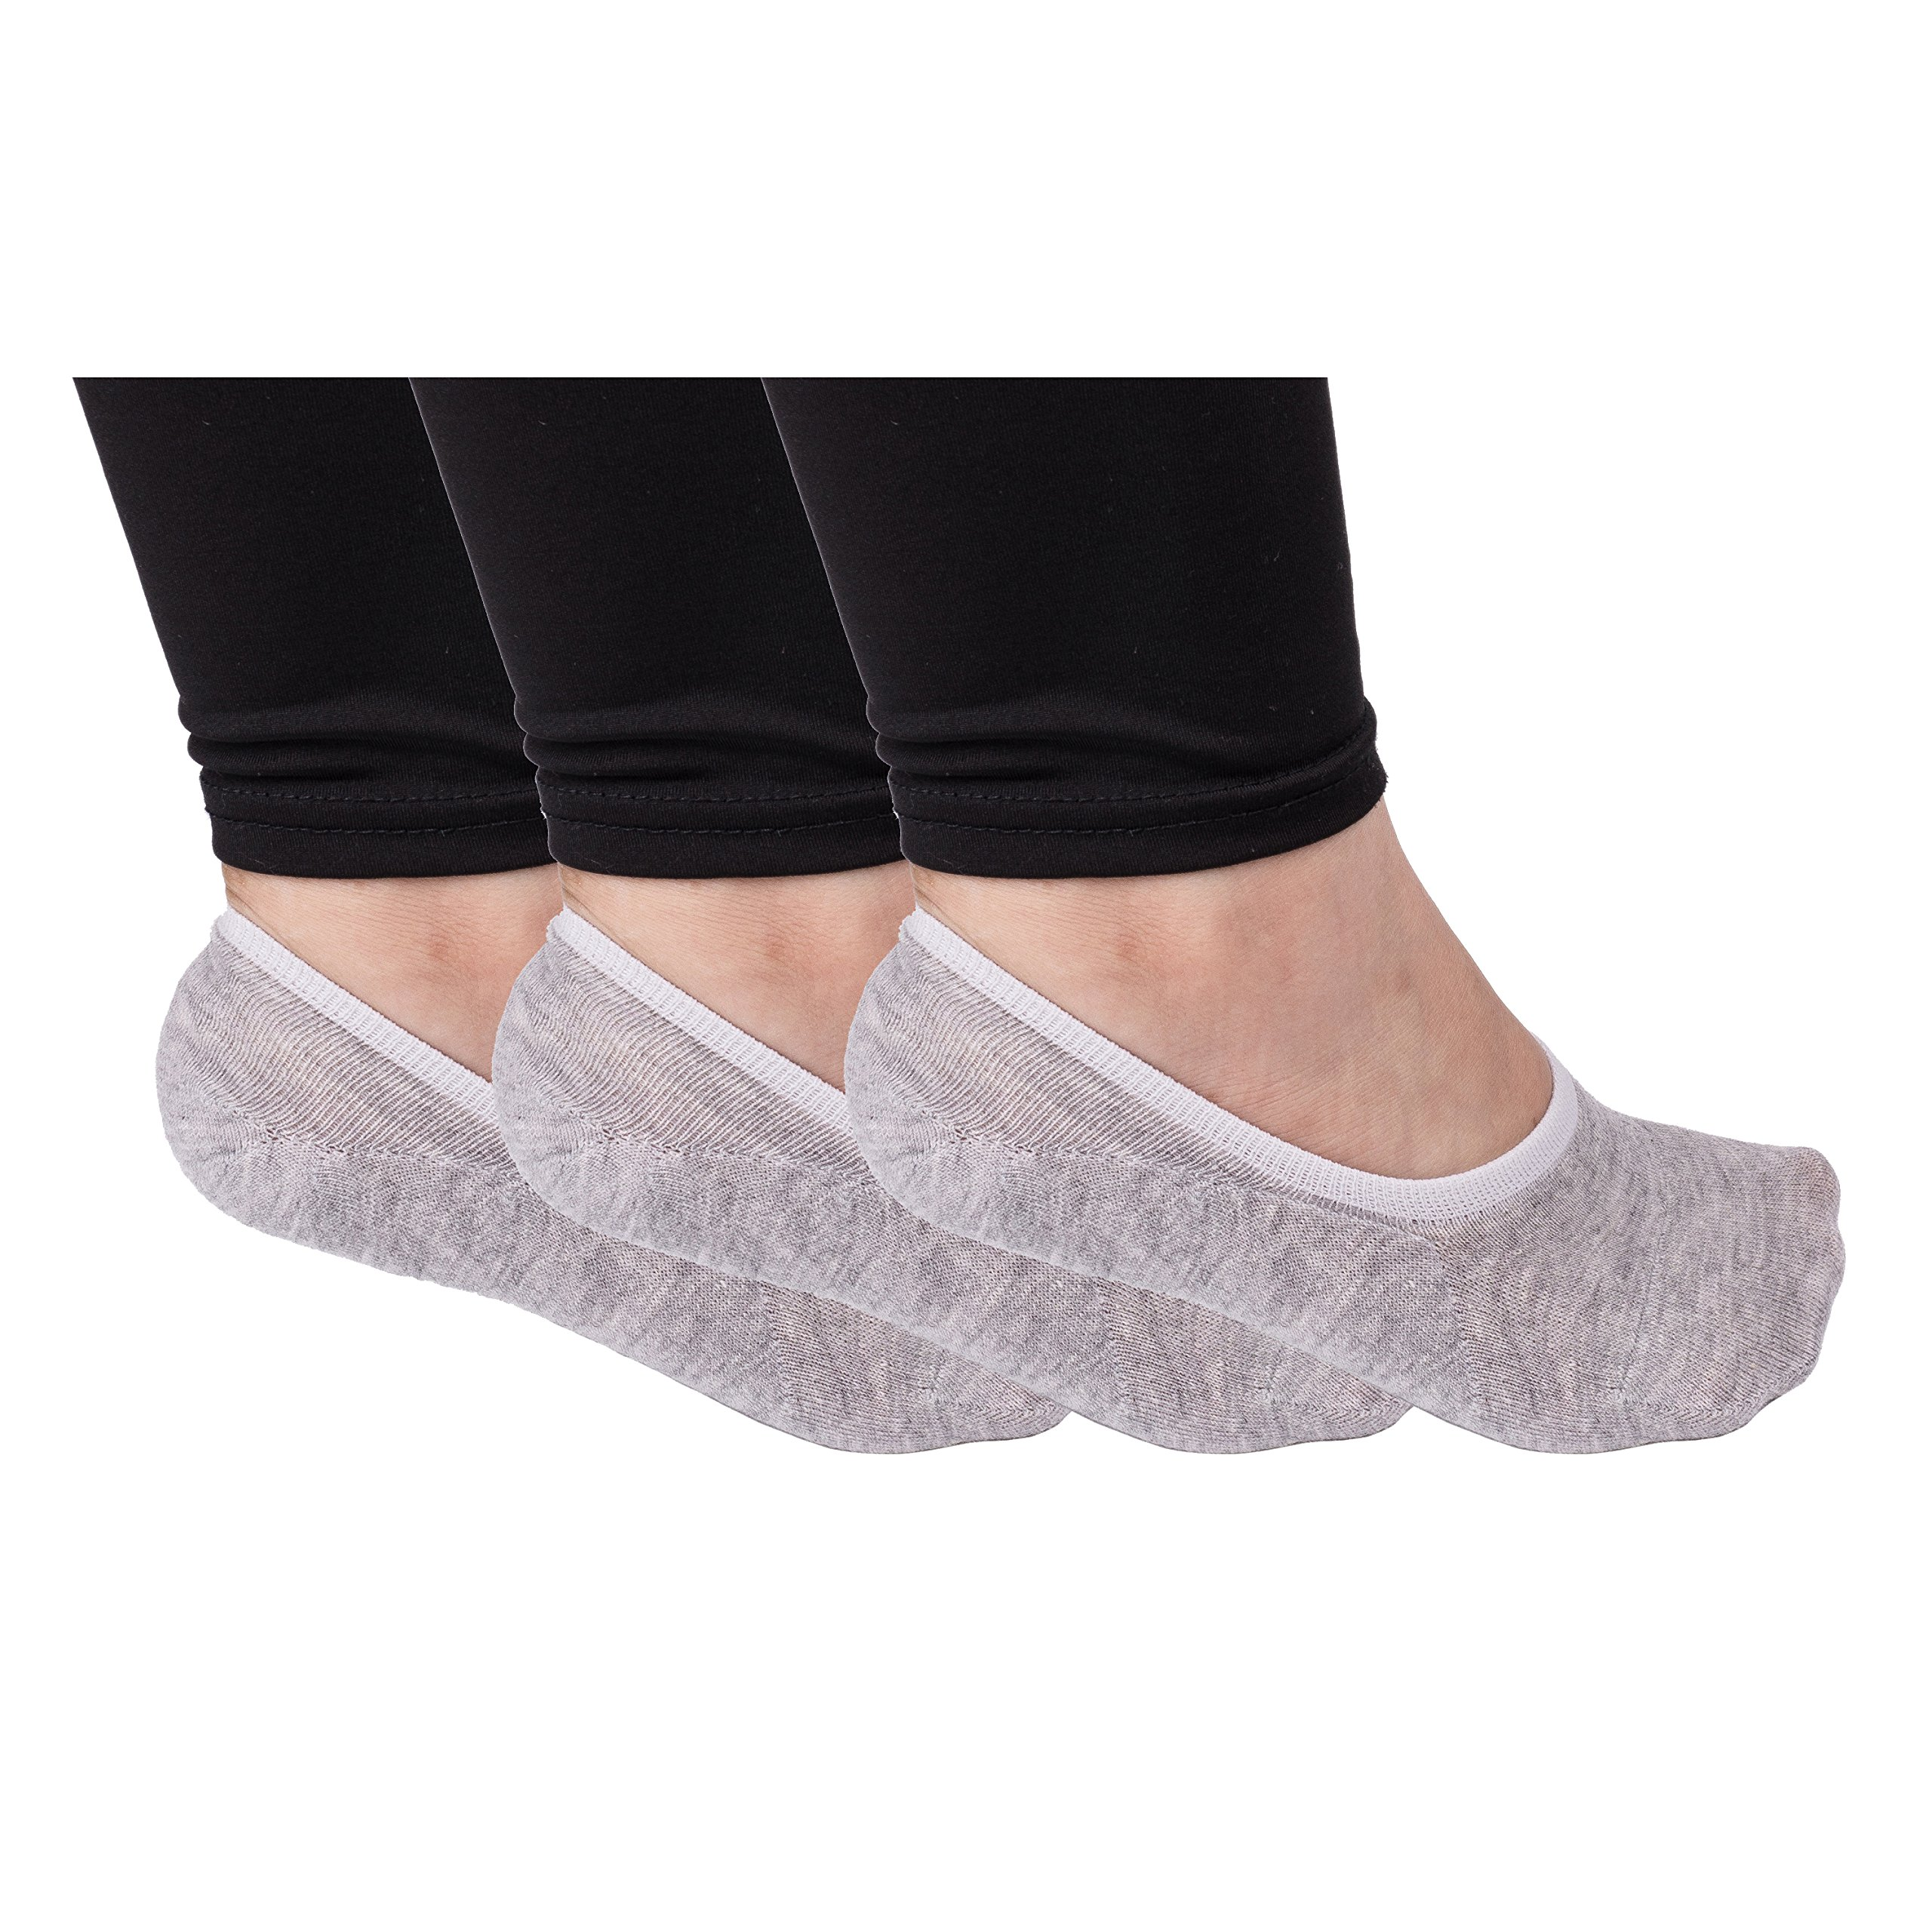 LALUNA BRIDE Women's Casual Non-Slip No-Show Low cut Liner Socks Pack of 3 Pairs Grey